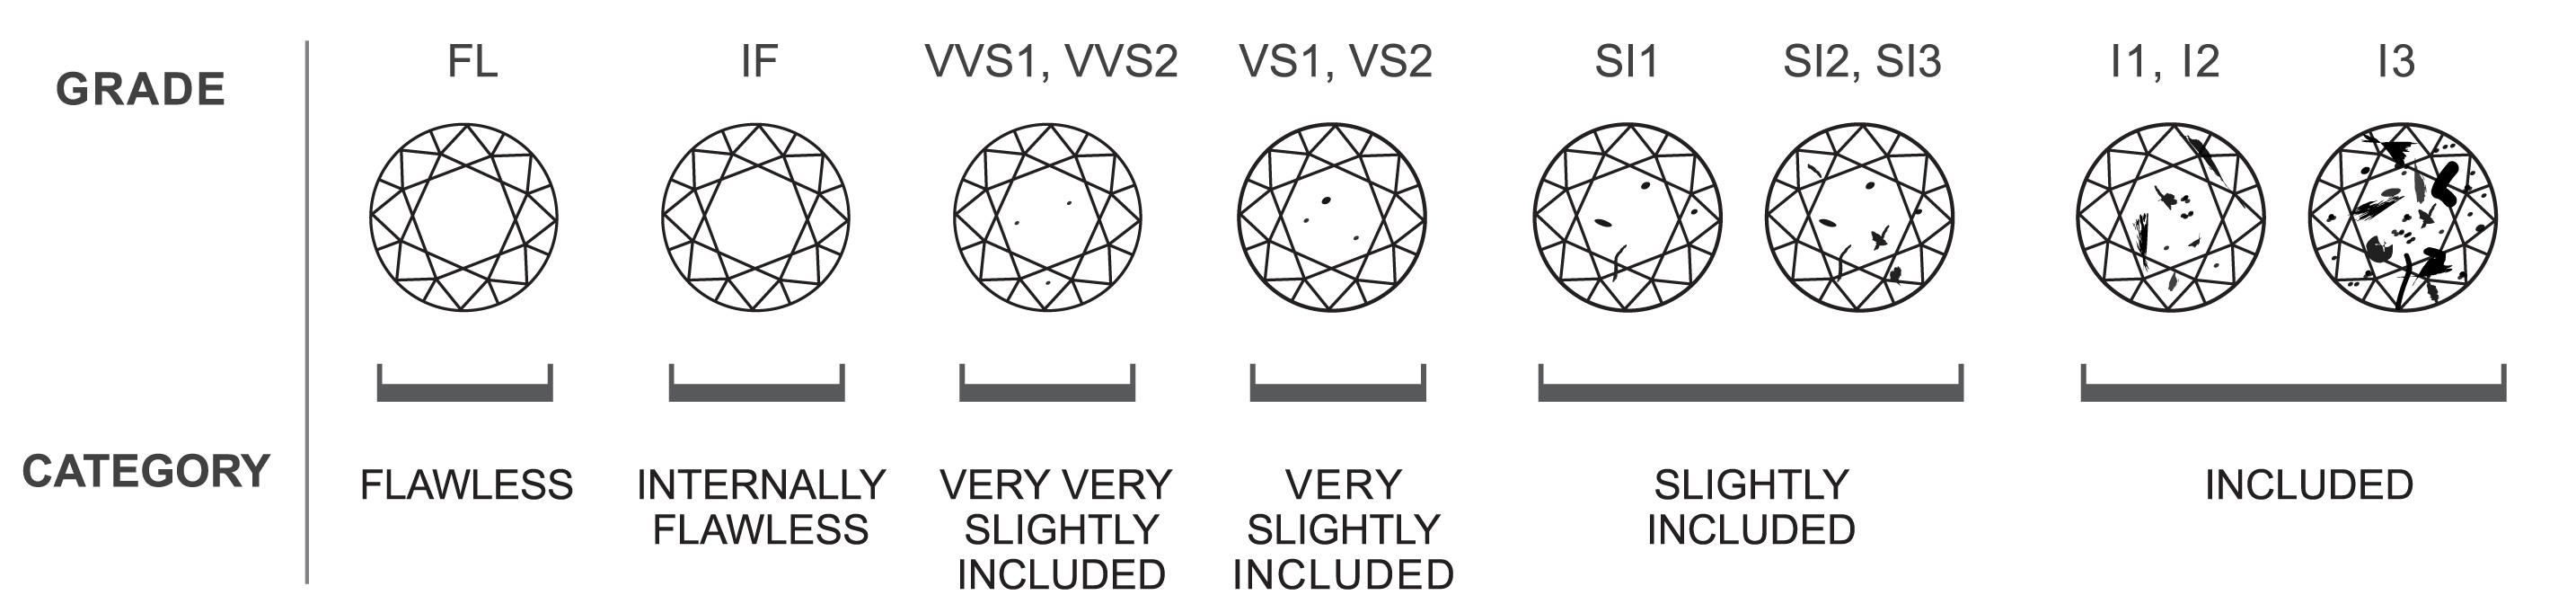 diamond-clarity-chart.jpg